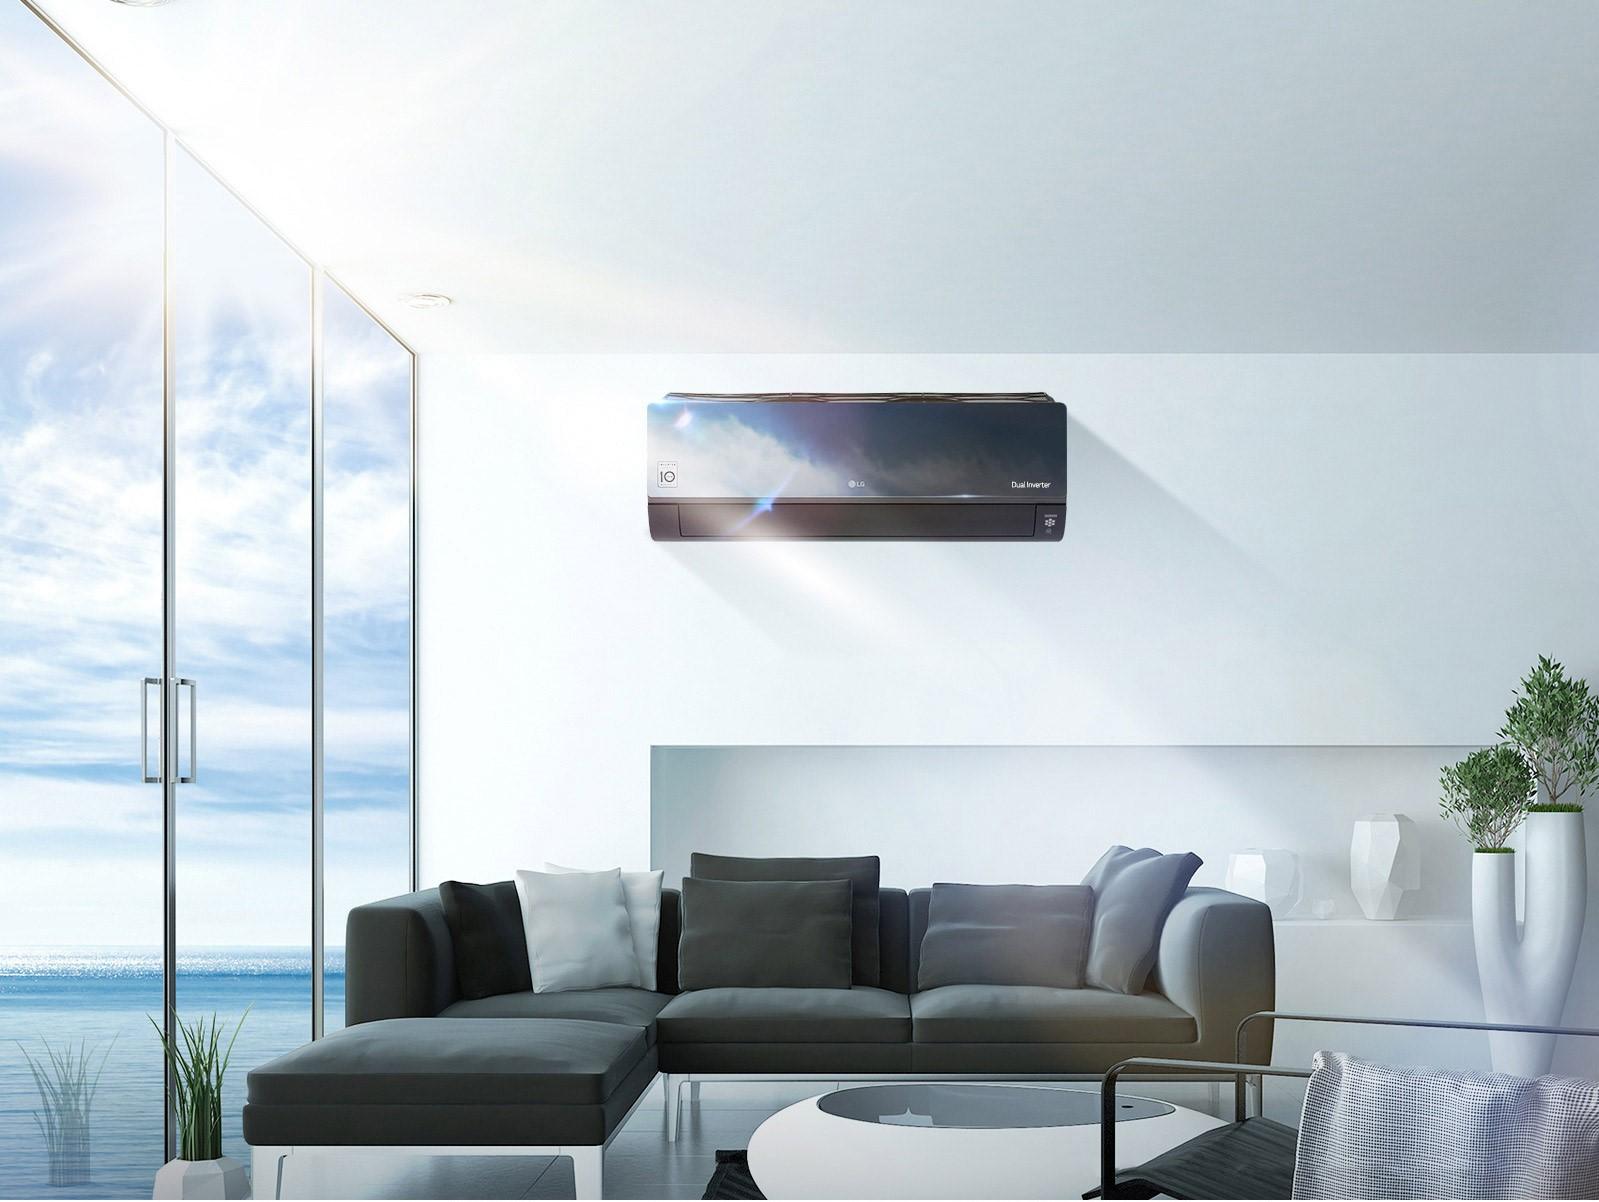 H LG παρουσιάζει τα νέα μοντέλα κλιματιστικών Gallery και Mirror της σειράς ARTCOOL